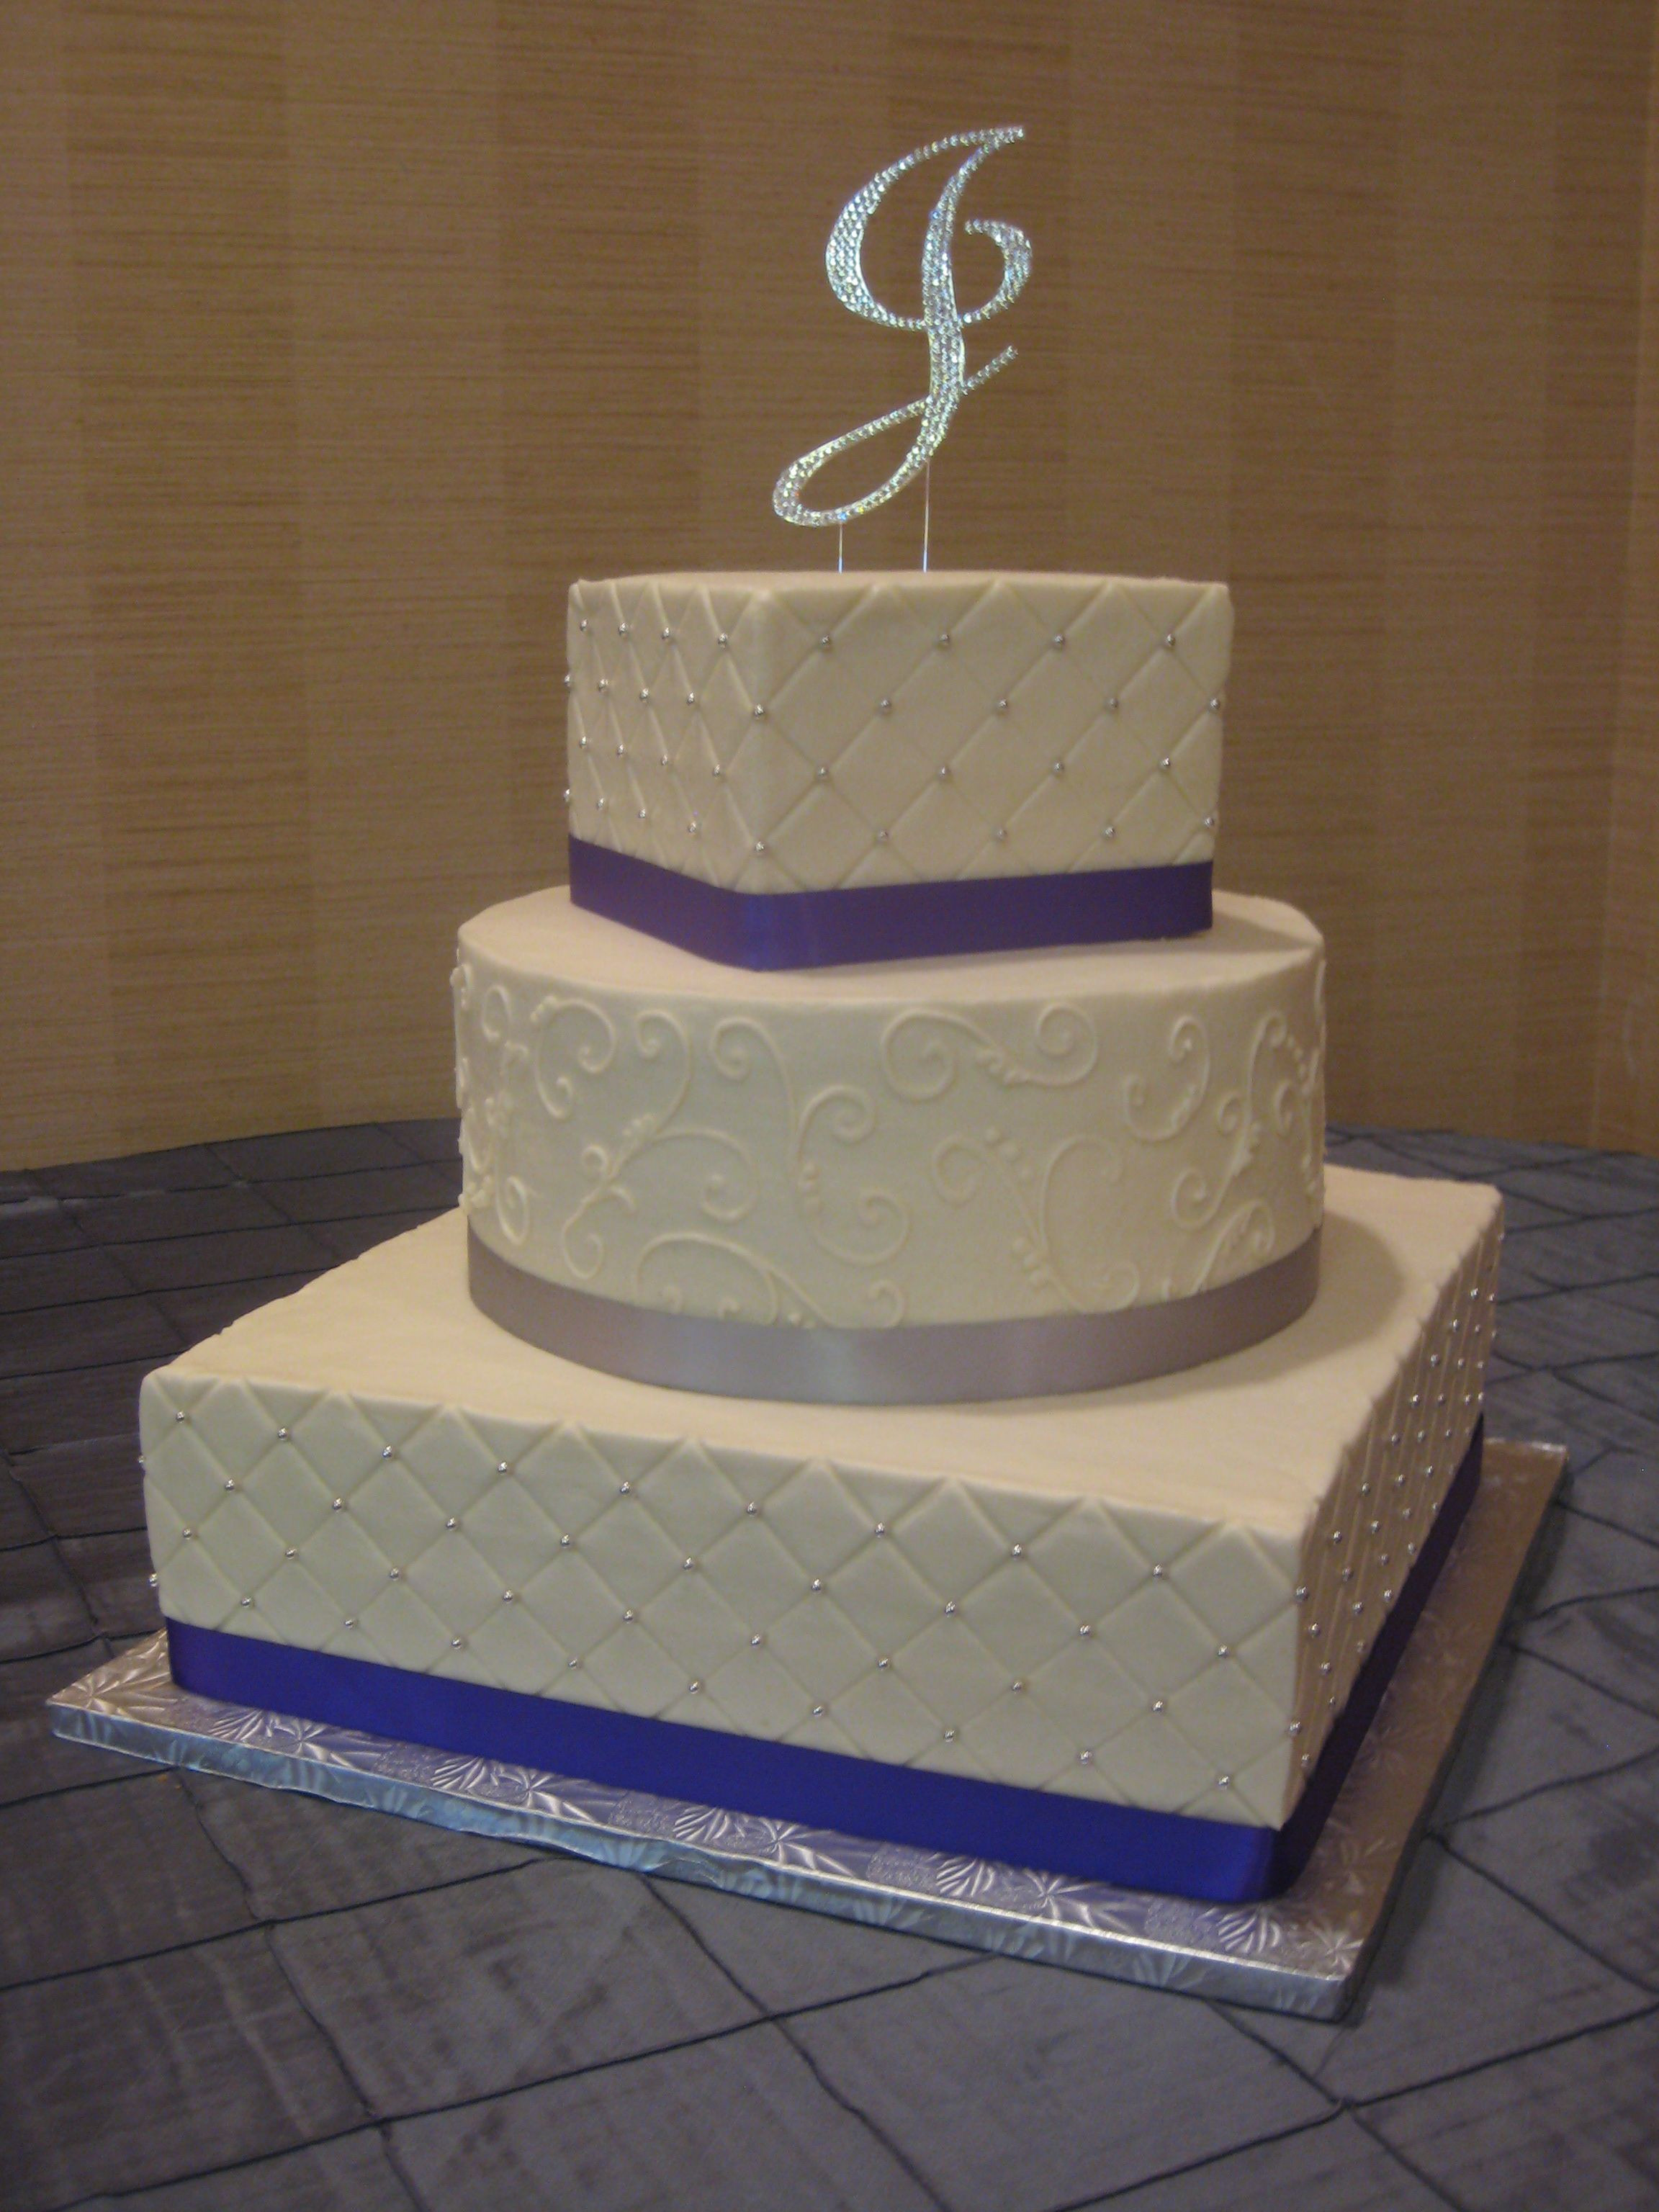 Square And Round Wedding Cakes  3 tier square and round wedding cake with diamond